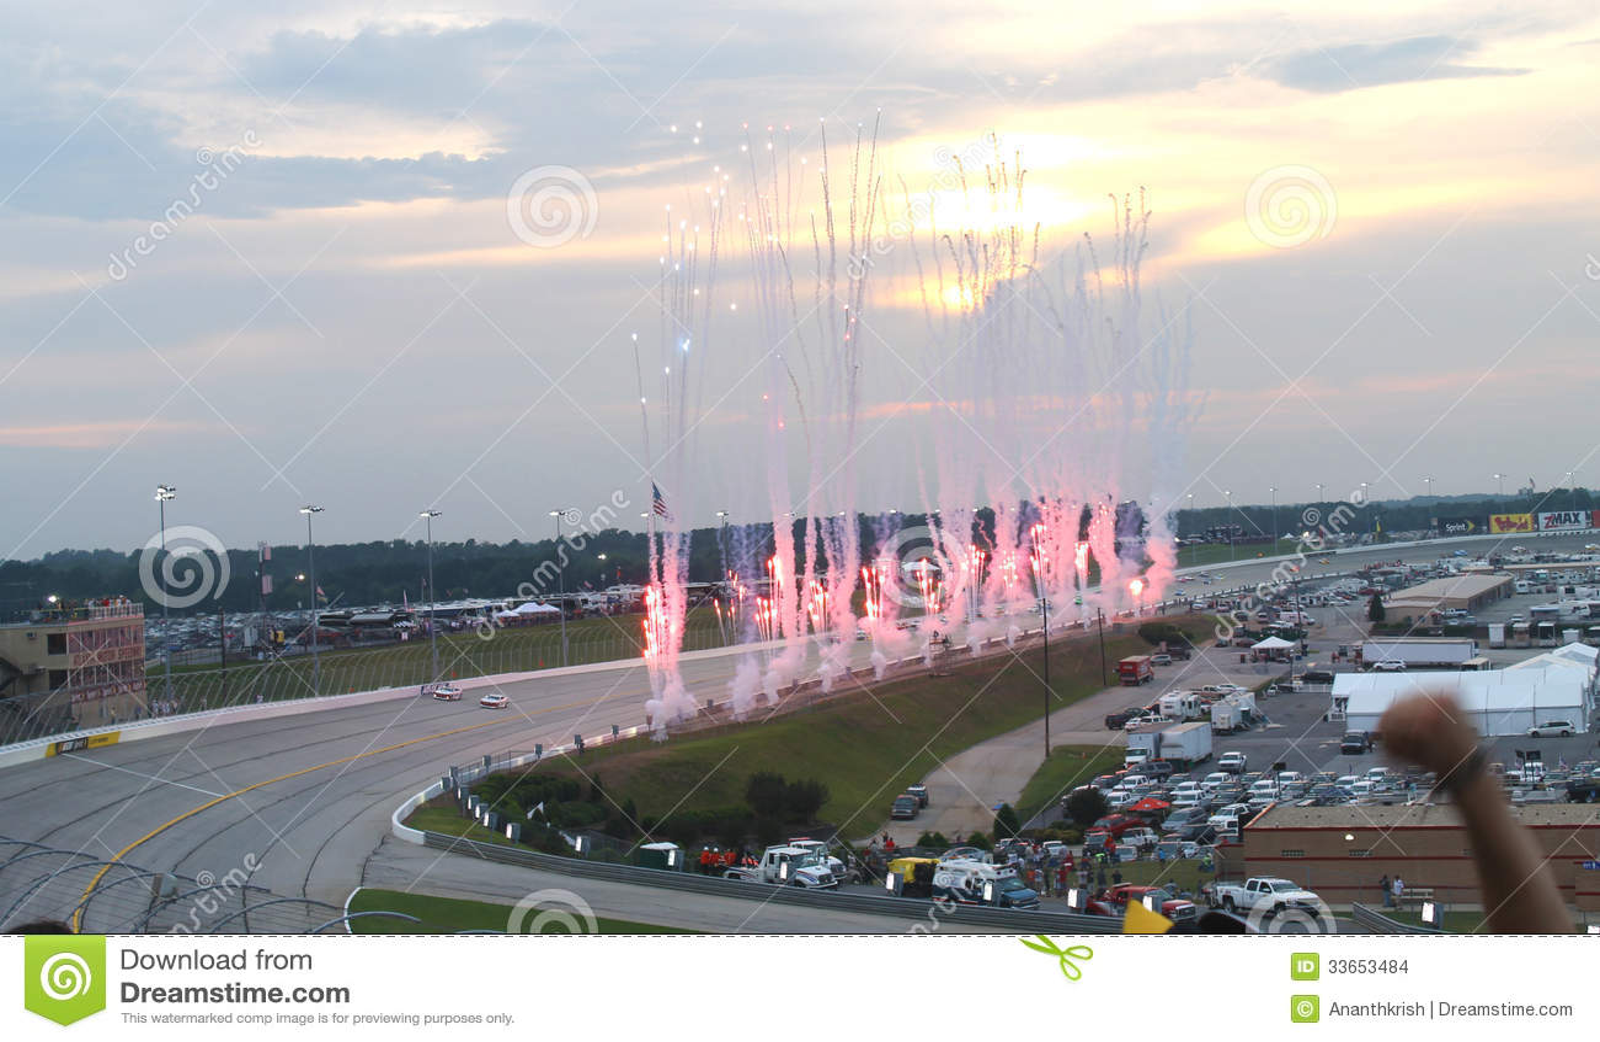 Nascar Sprint Cup Atlanta Motor Speedway Editorial Stock